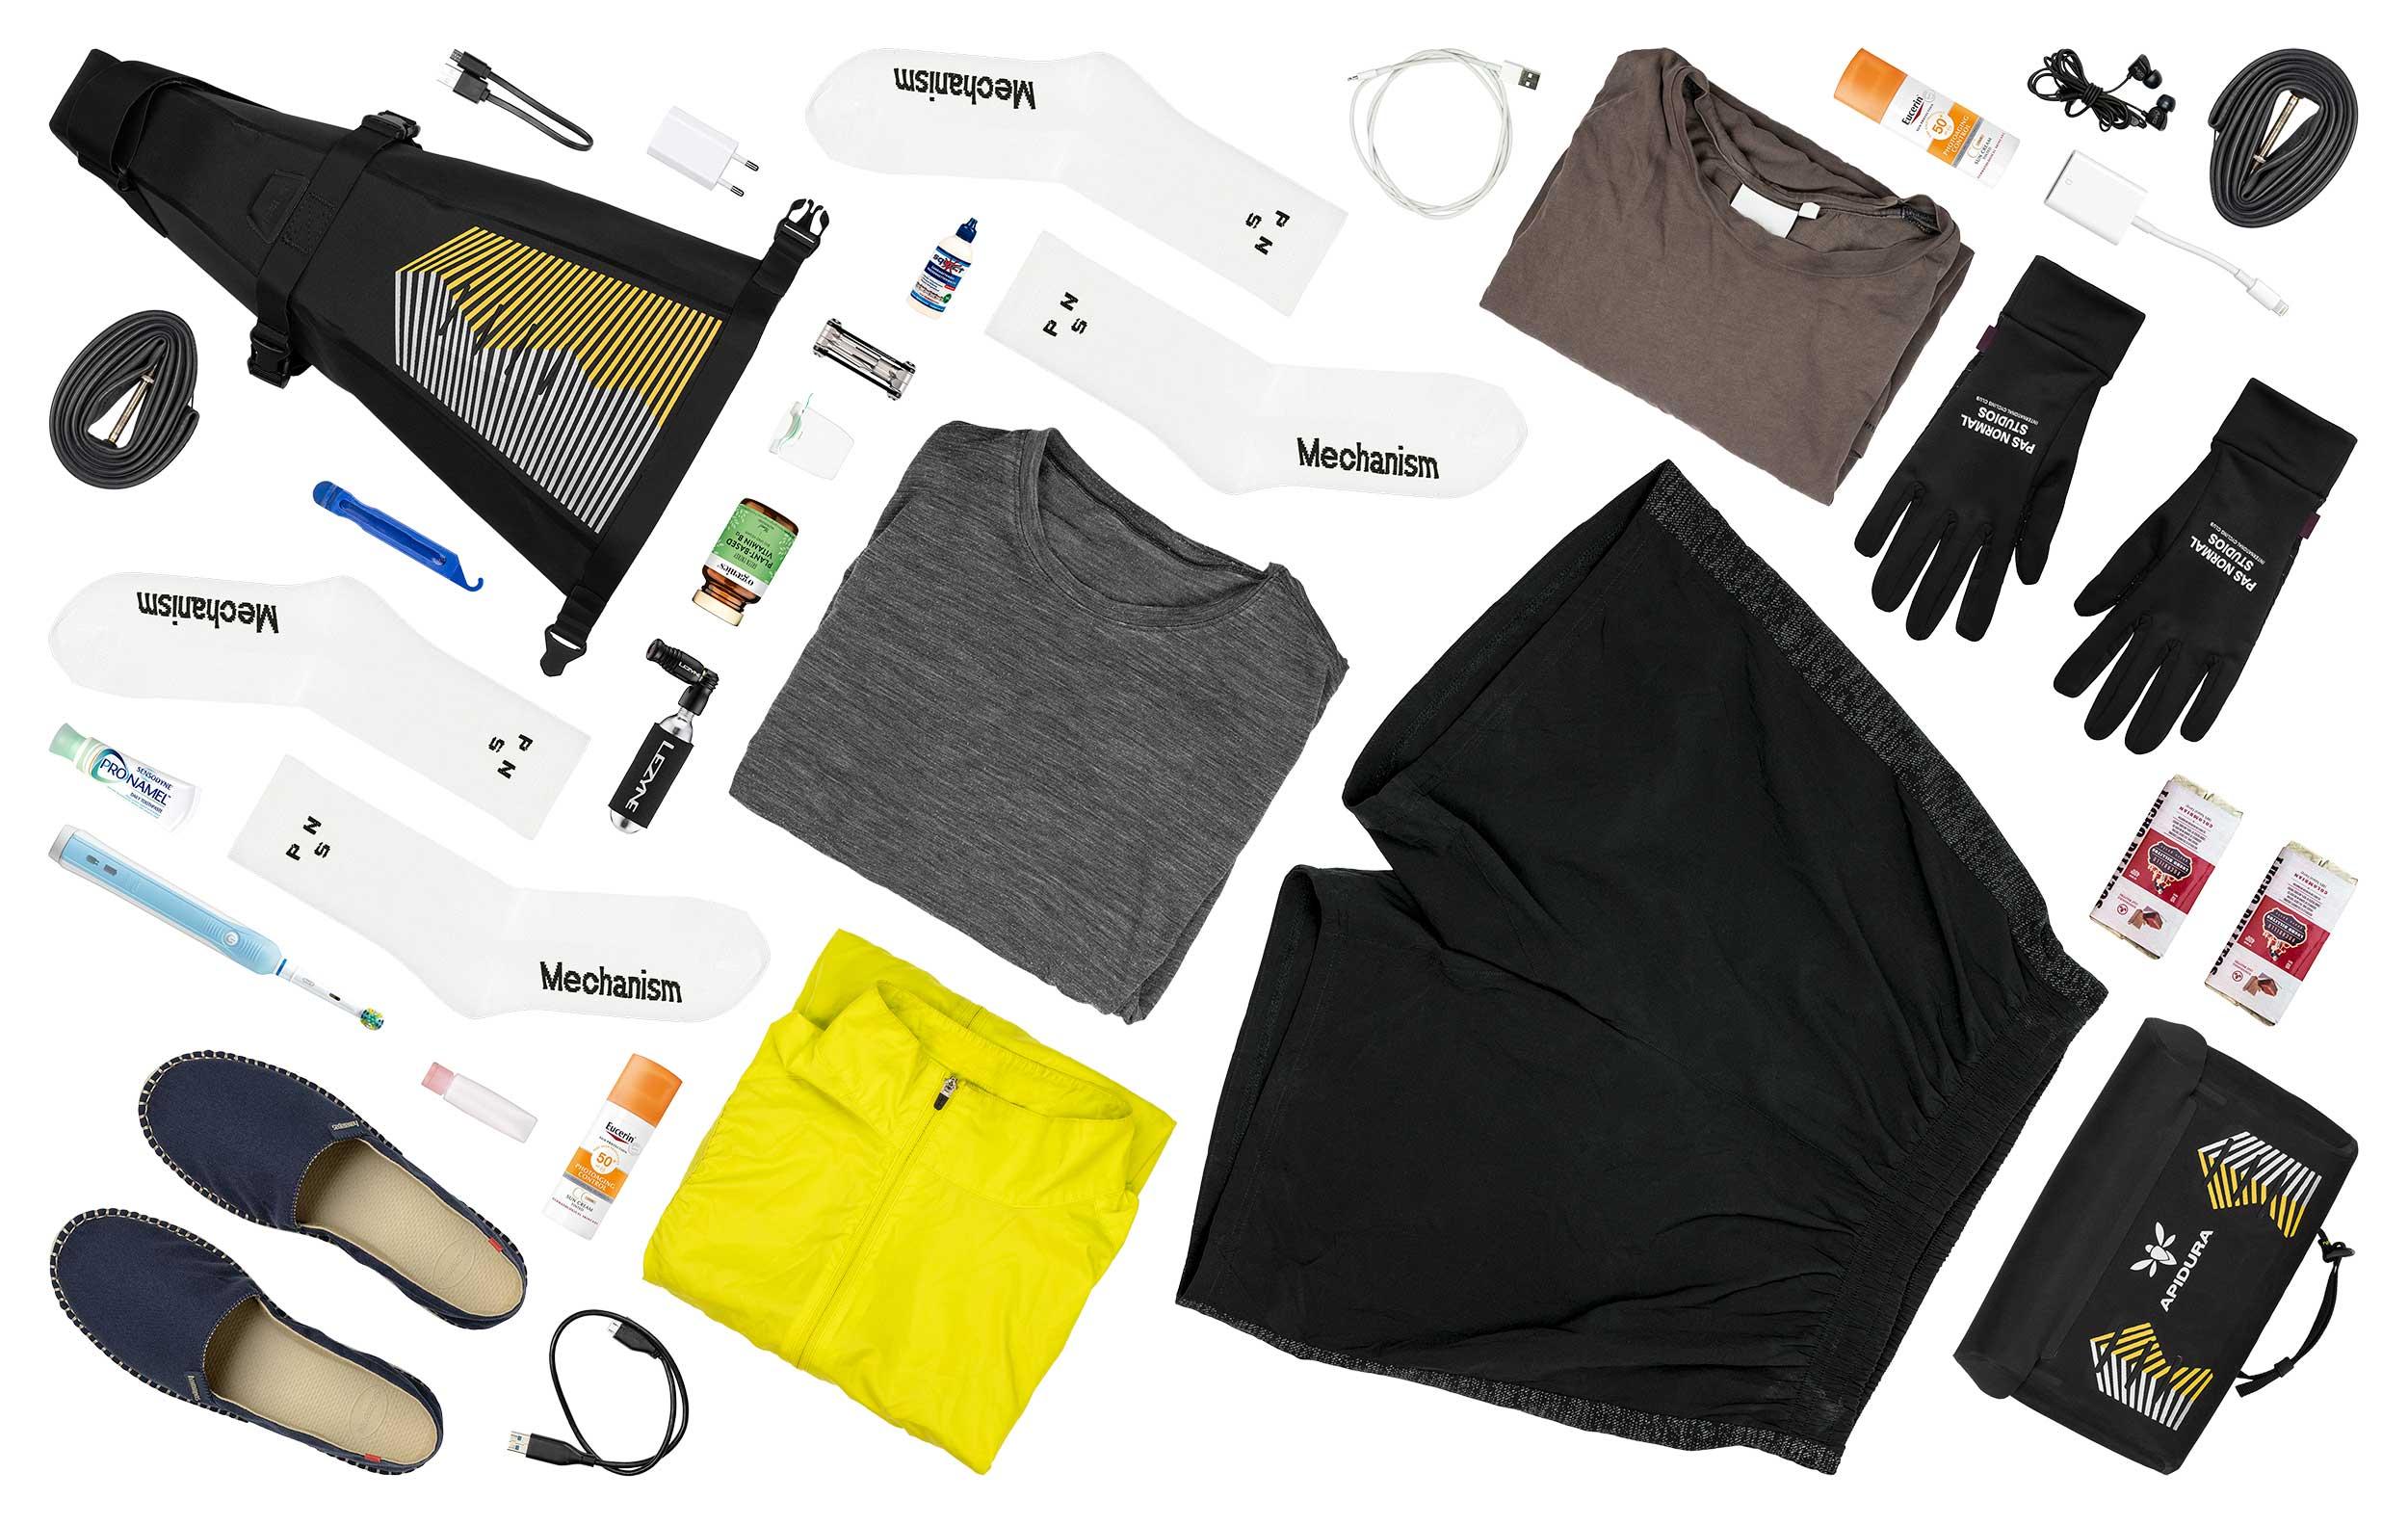 Joe Rass-Court's Fastpacking Columbia Kit Grid